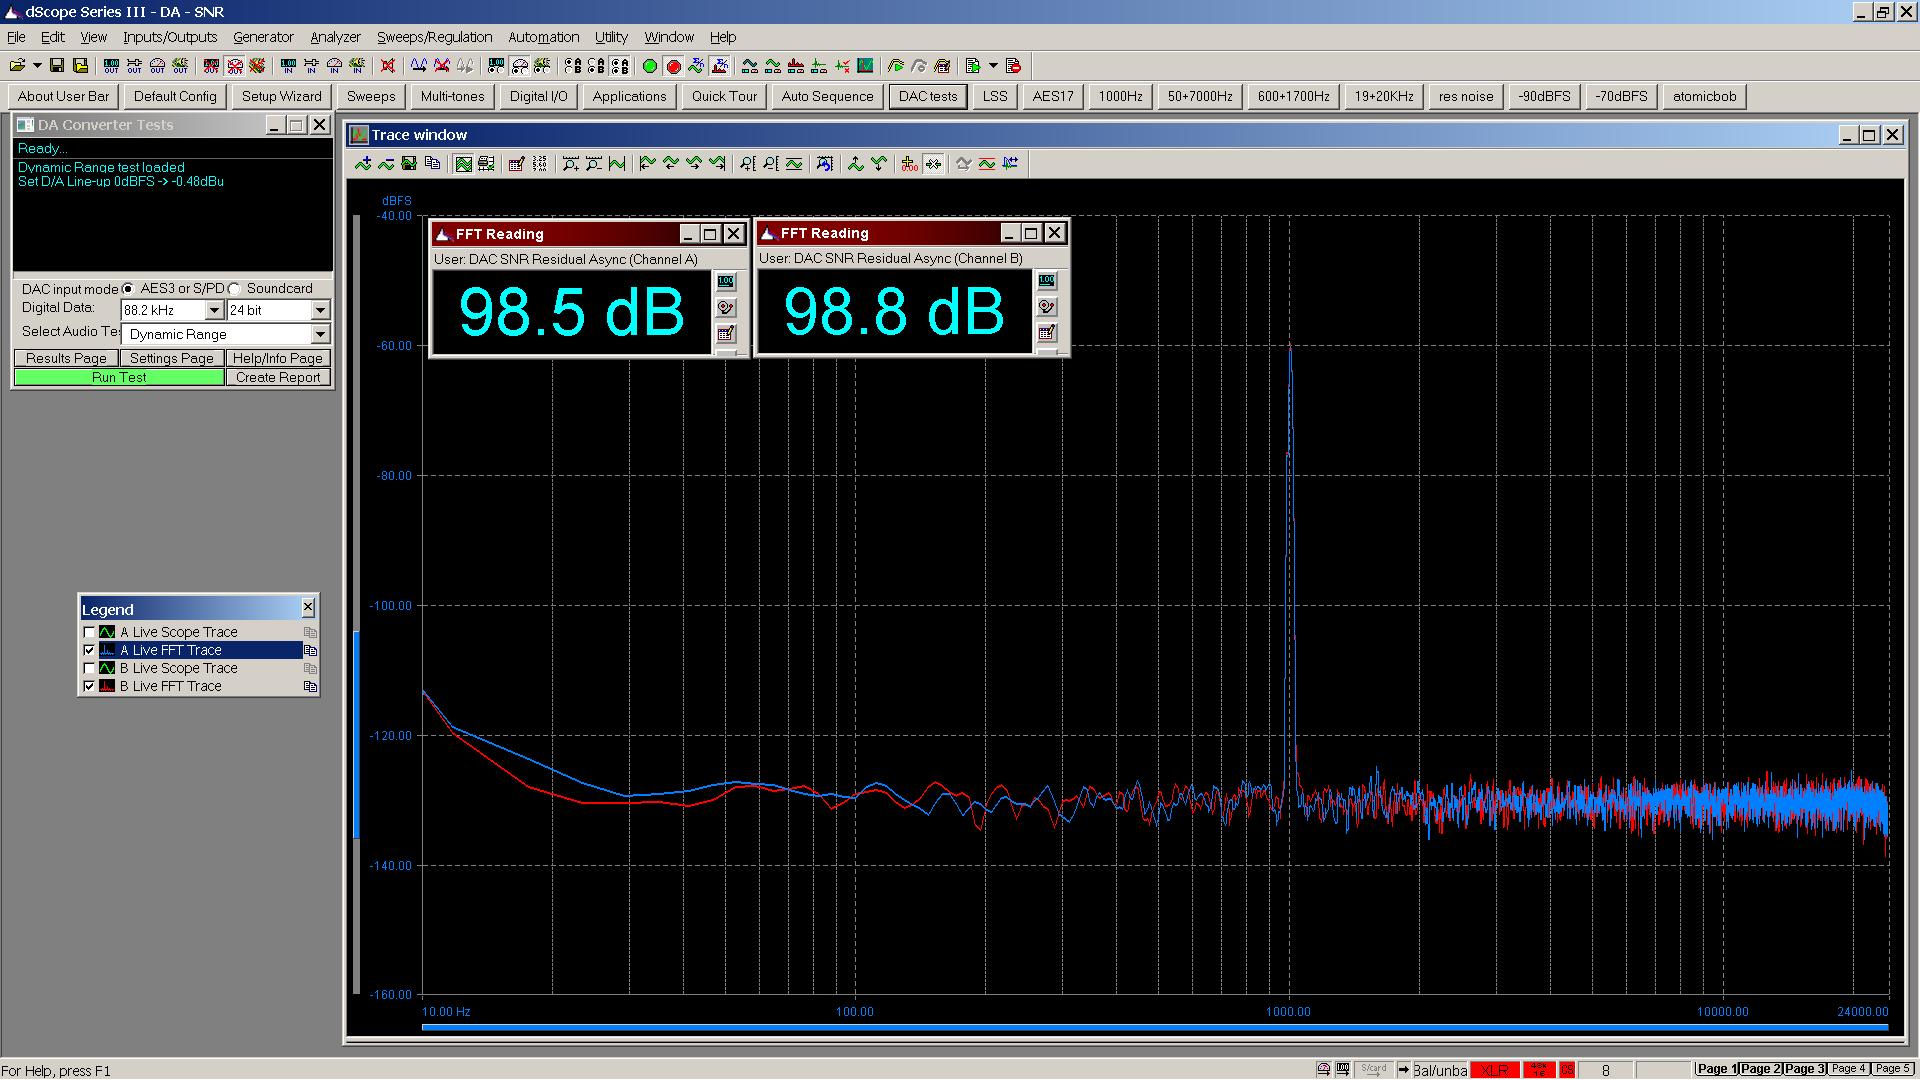 05 20190107-14 convert2 Bal dynamic range - AES -18dBFS ref 0 dBu out - int atten.PNG